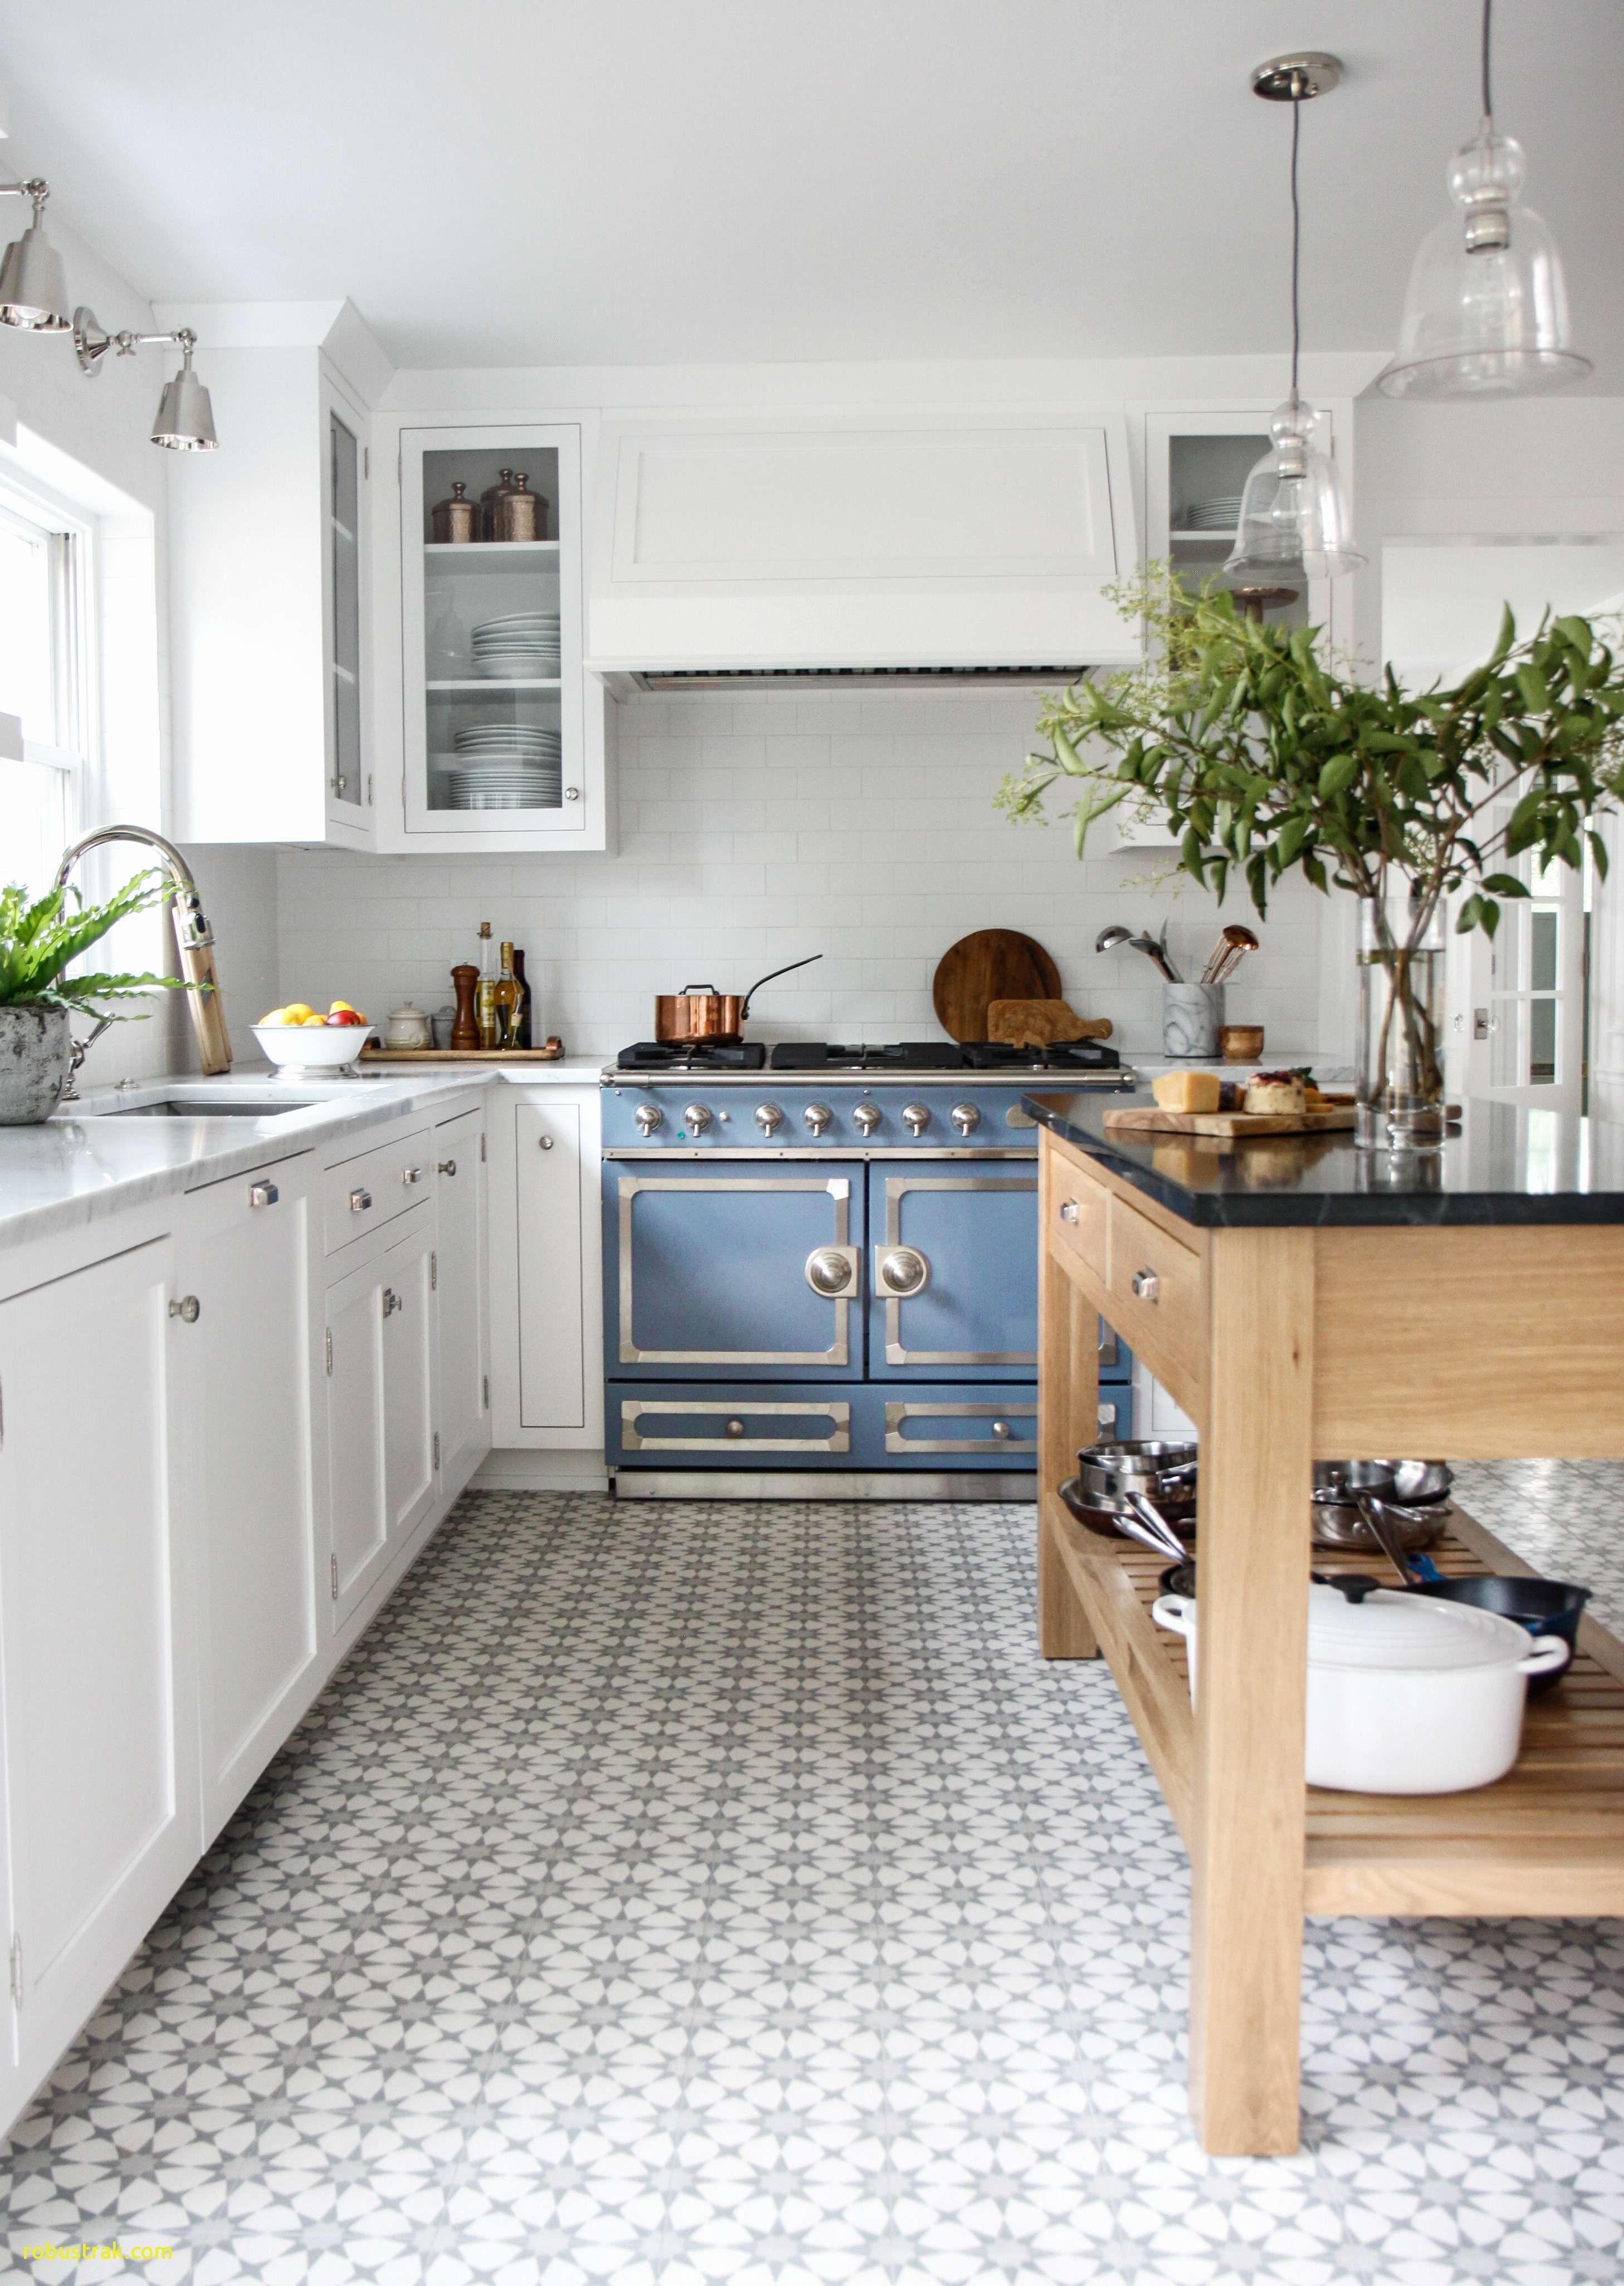 Inspirational Kitchen Backsplash For White Cabinets Inspiration Of Kitchen Floor Tile Ideas With White Cabinets Kitchen Design Small Kitchen Design Kitchen Renovation